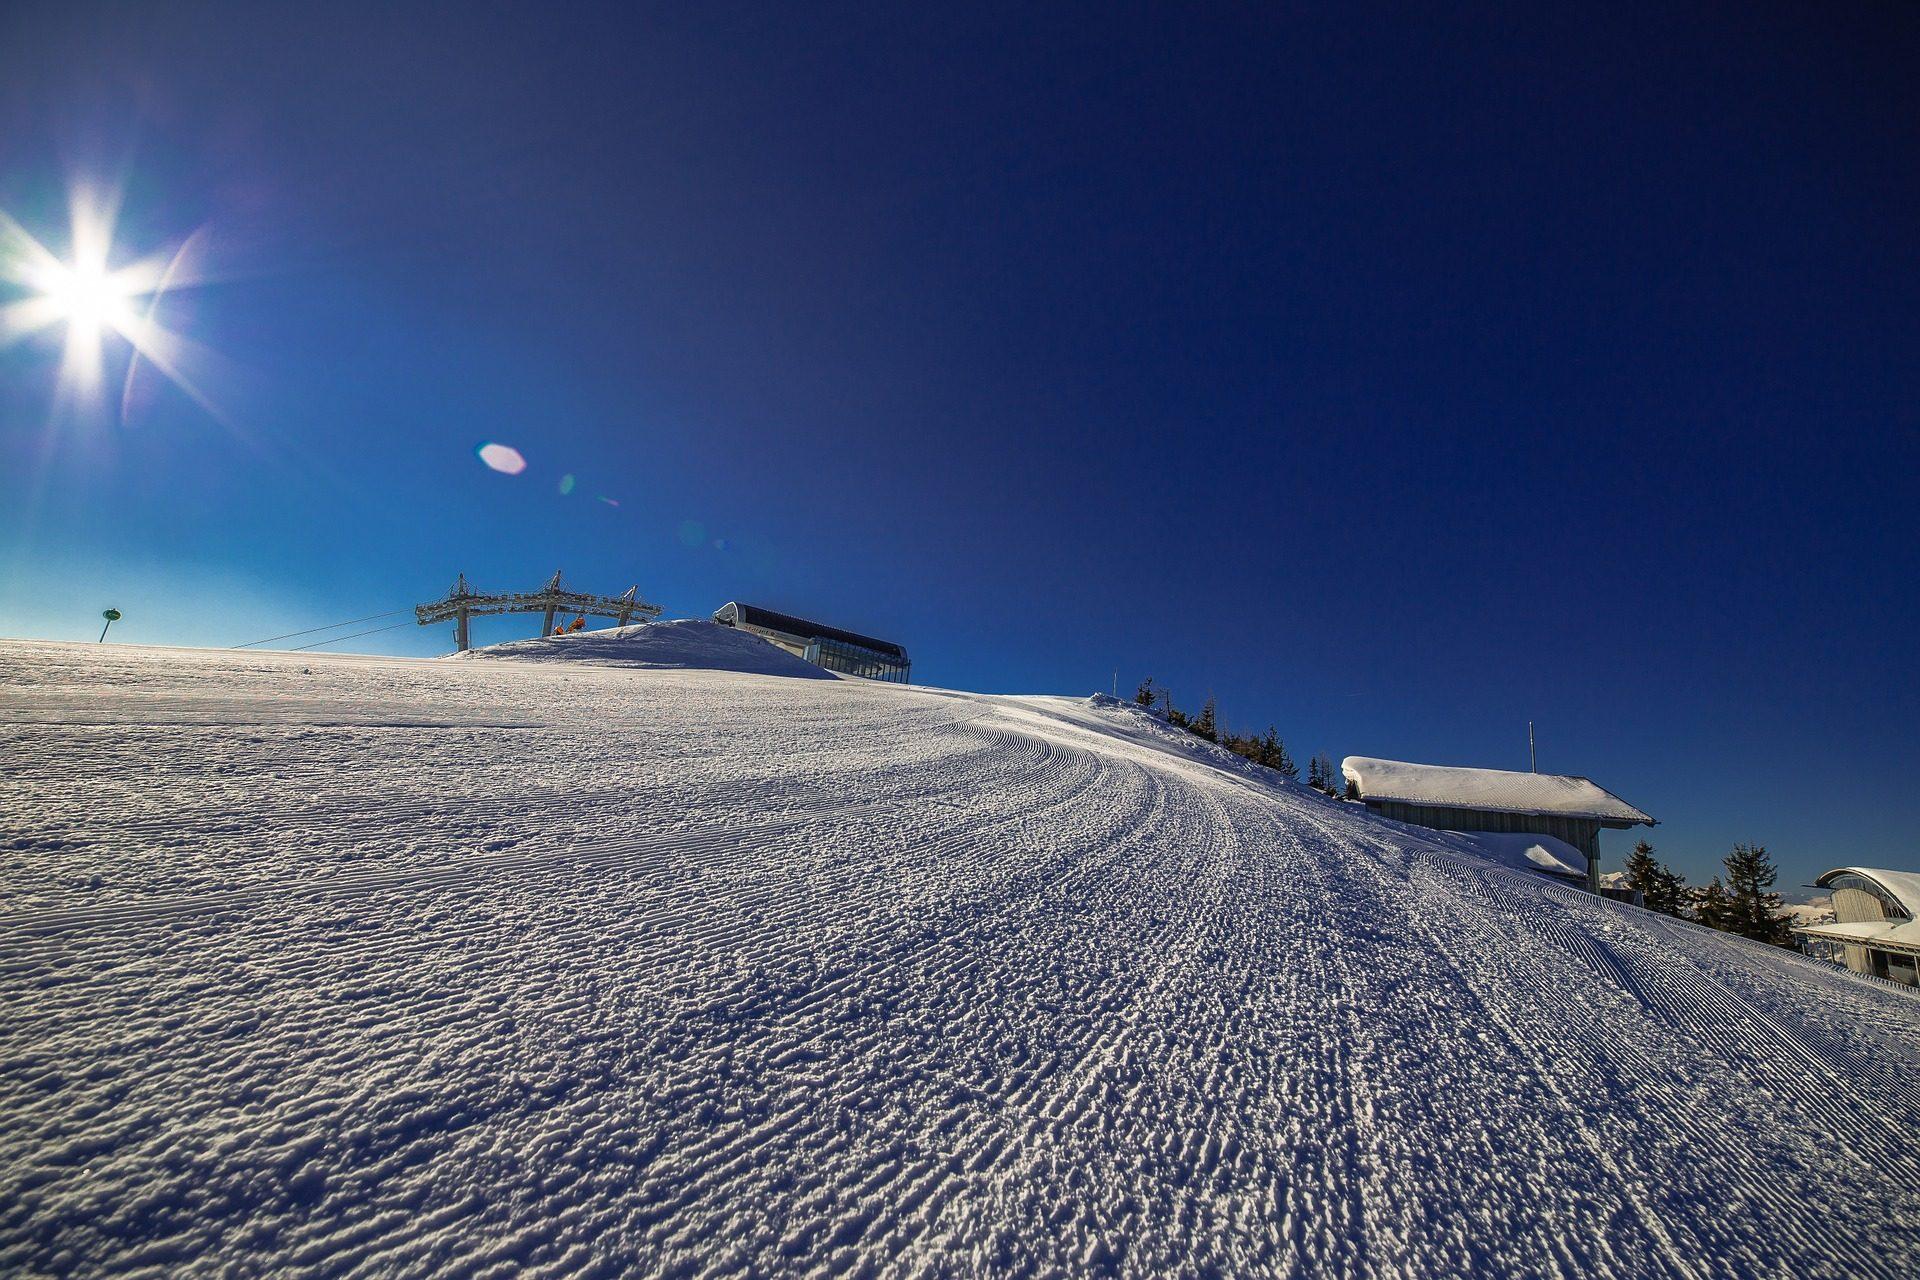 Skiurlaub in Söll - eine Woche günstig ab 78,19€ p.P = Tirol-Innsbruck